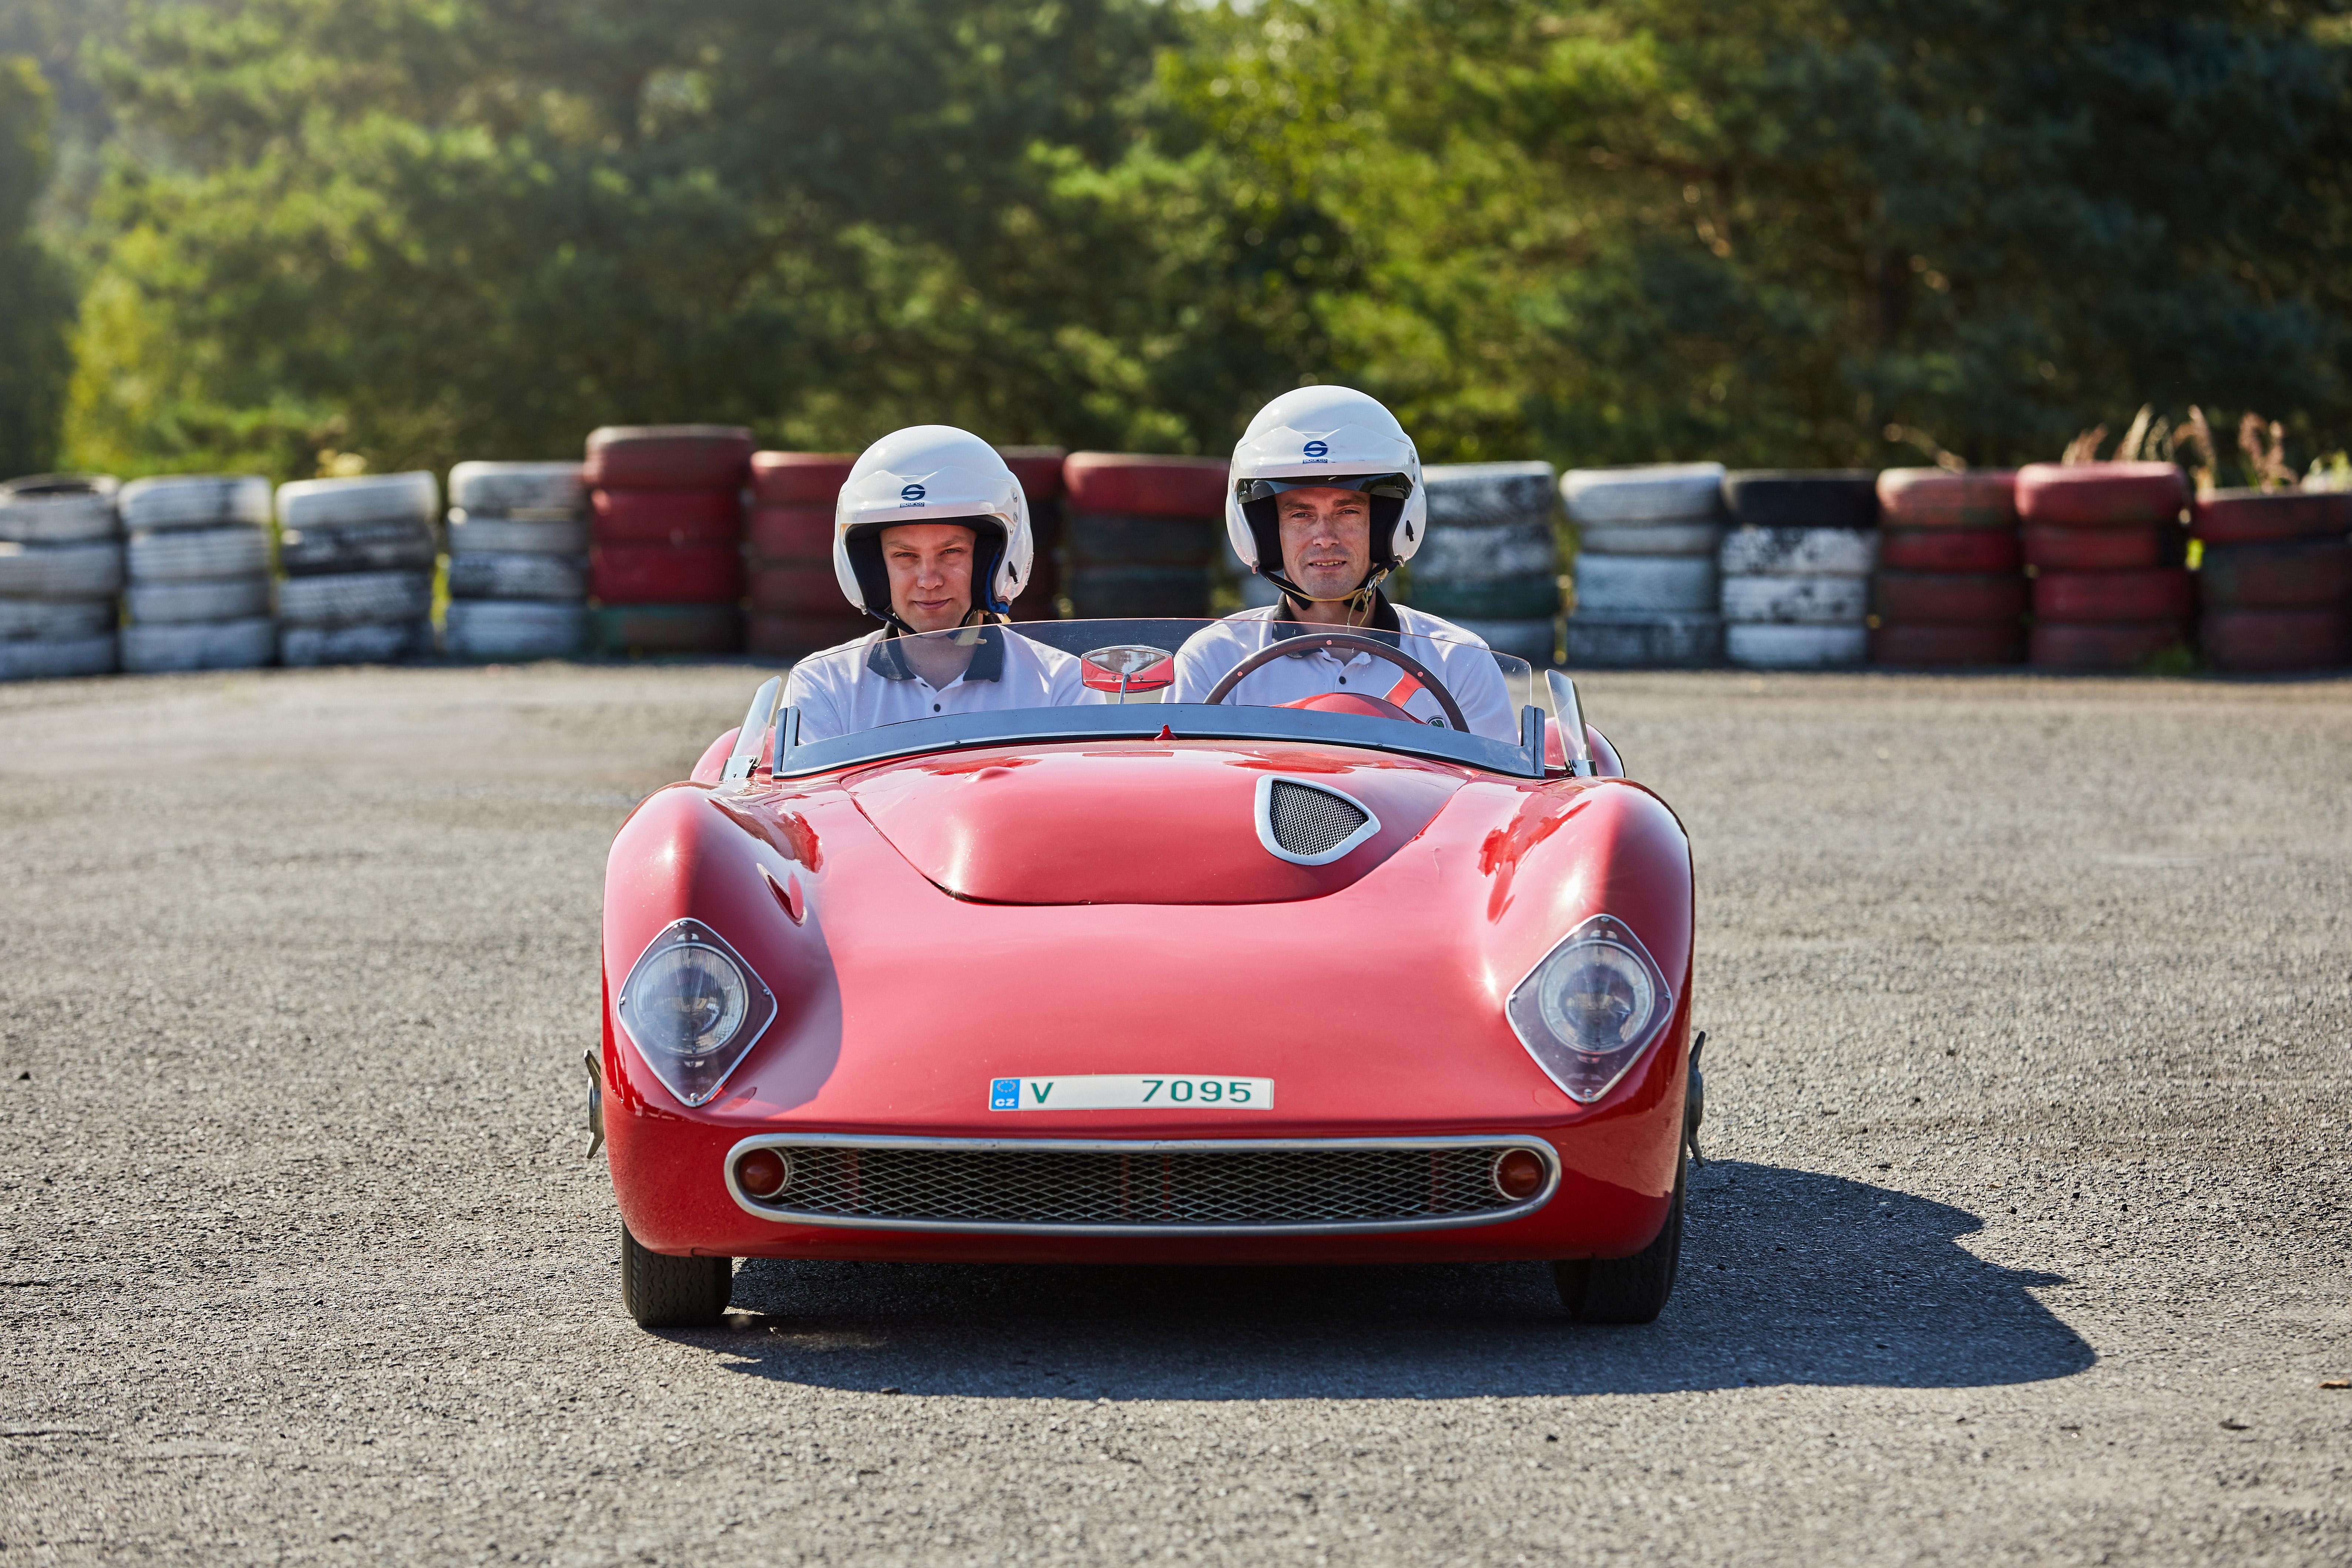 SKODA SLAVIA endurance test: Student Car 2020 impresses rally professionals Jan Kopecký and Jan Hlousek - Image 4